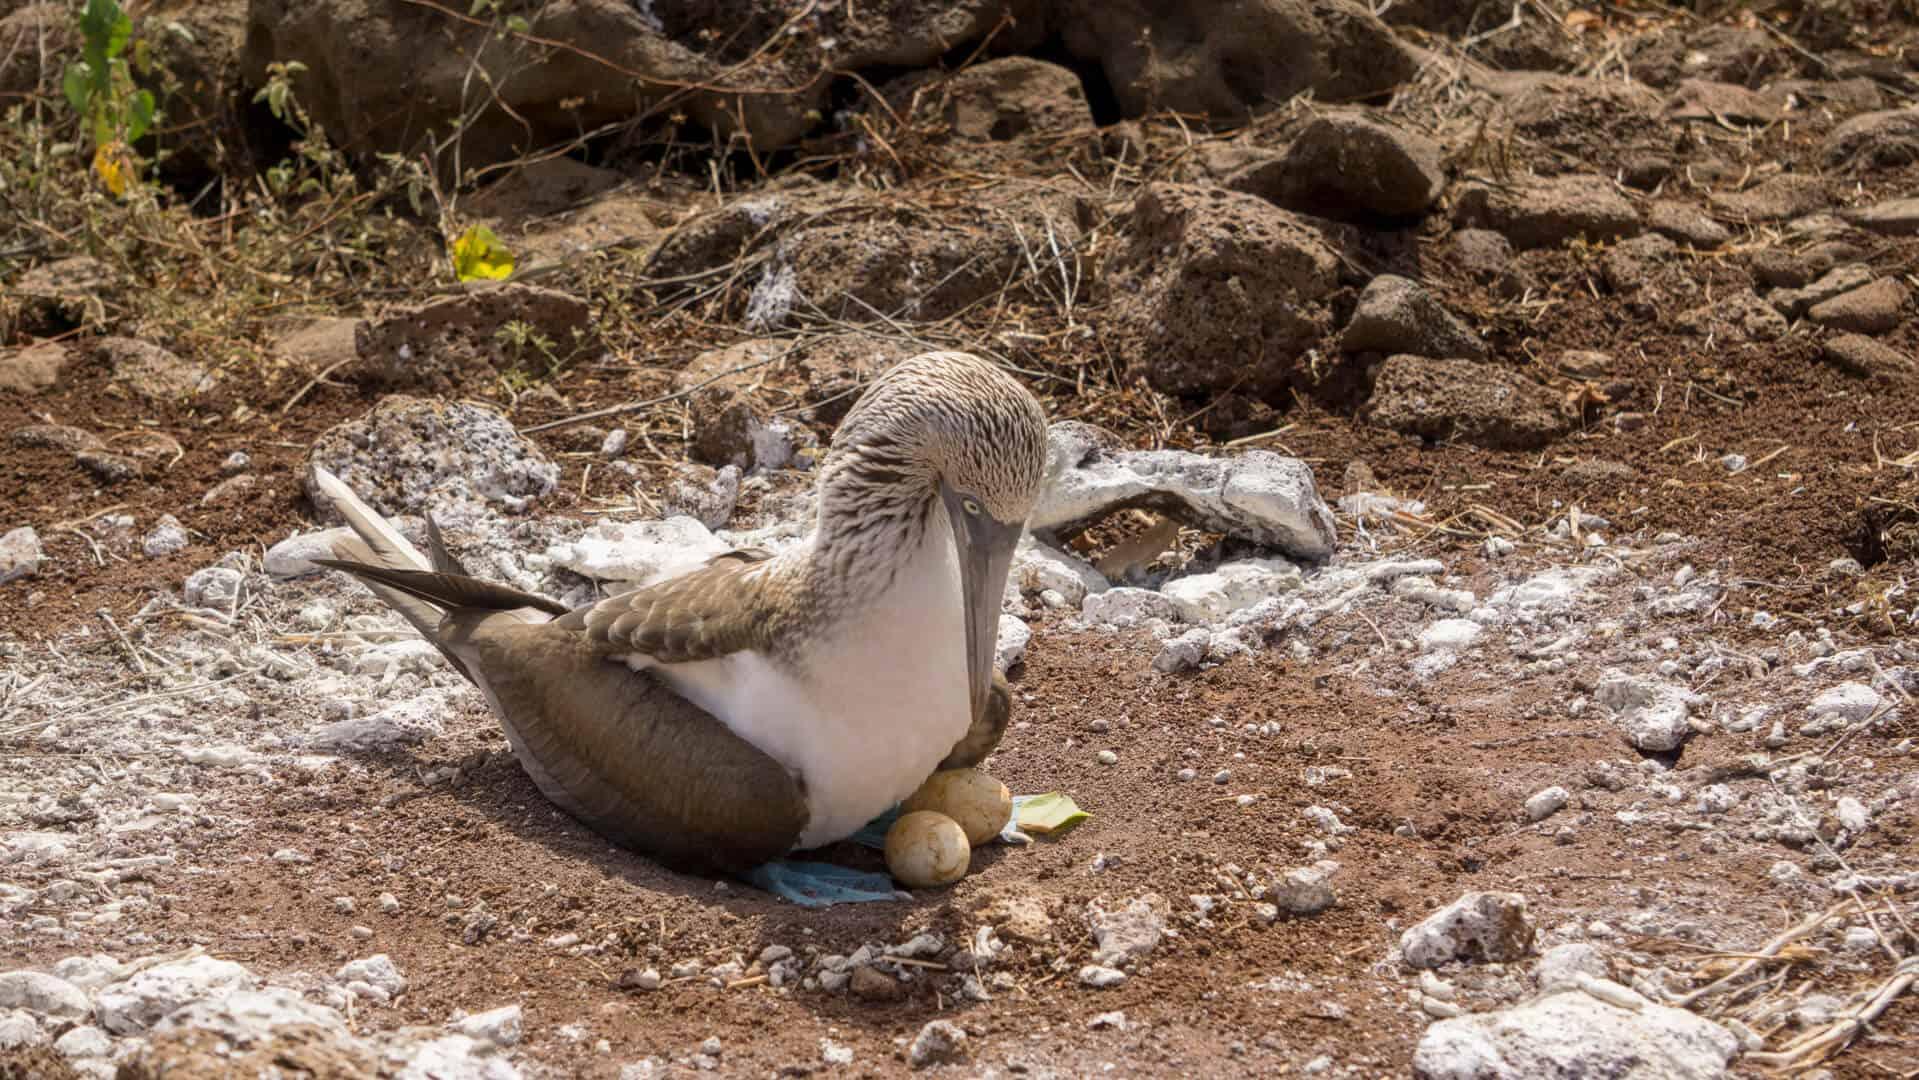 A nesting boobie on Lobo island